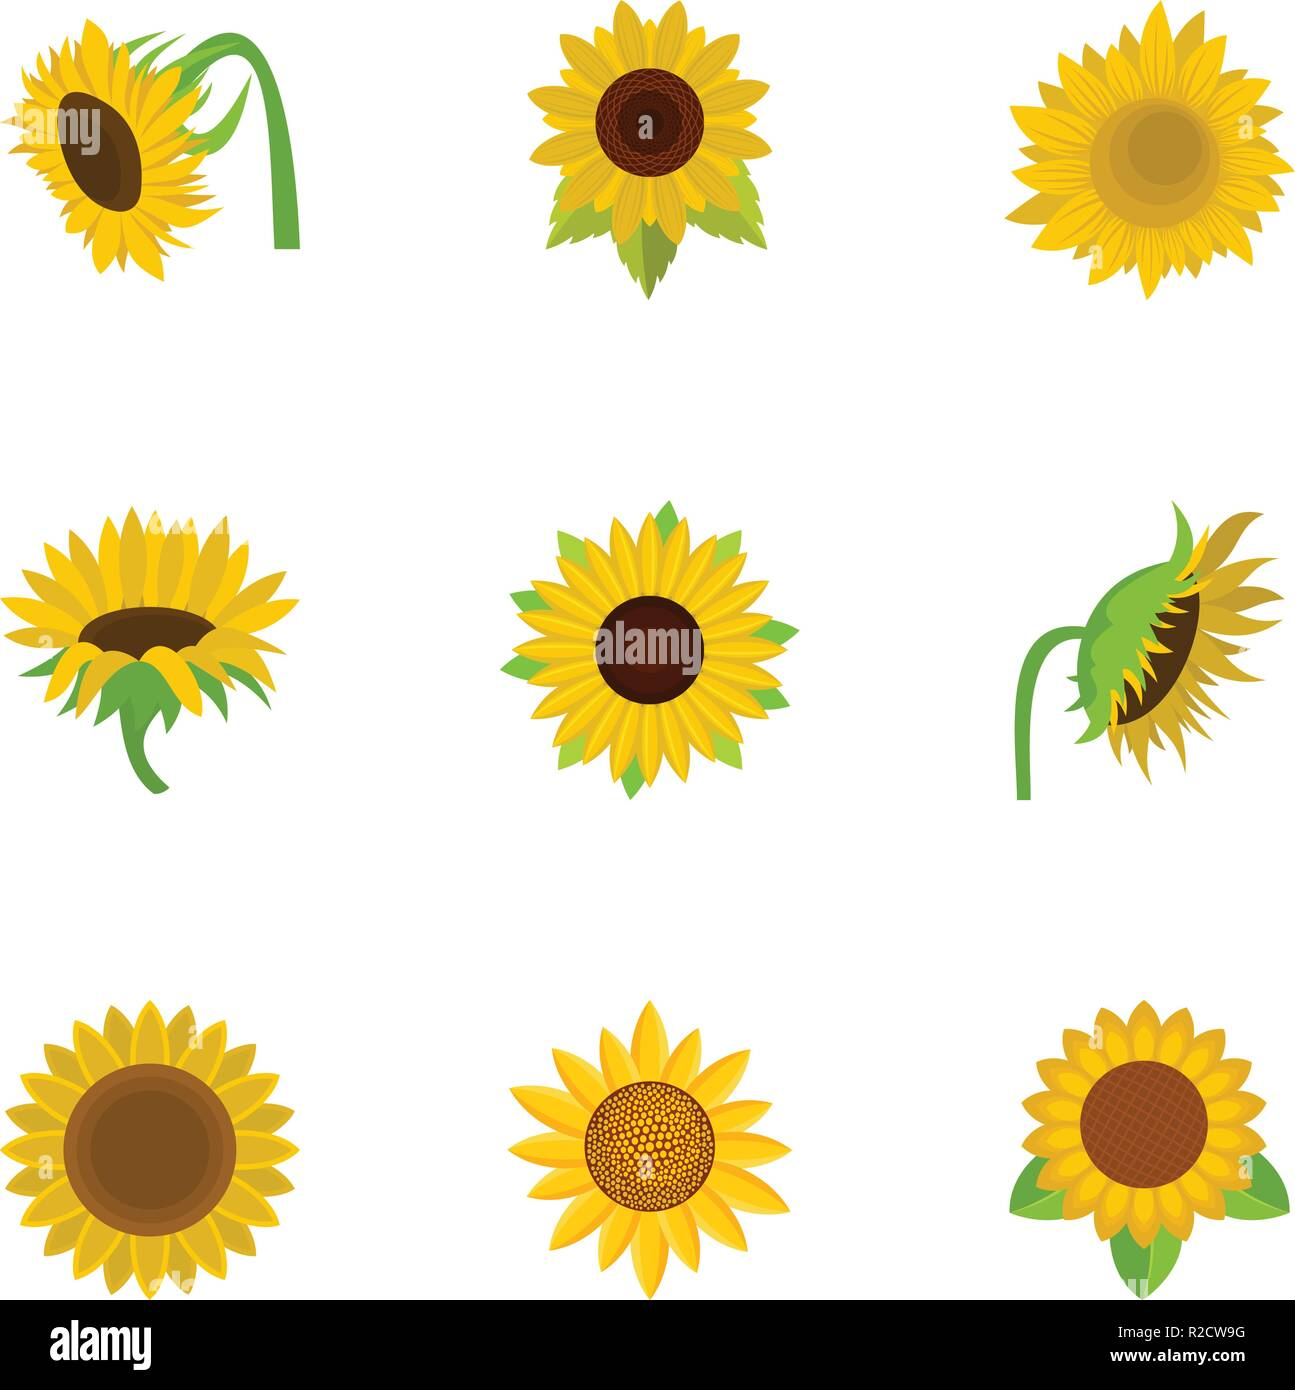 Sunflower Clip Art at Clker.com - vector clip art online, royalty free &  public domain